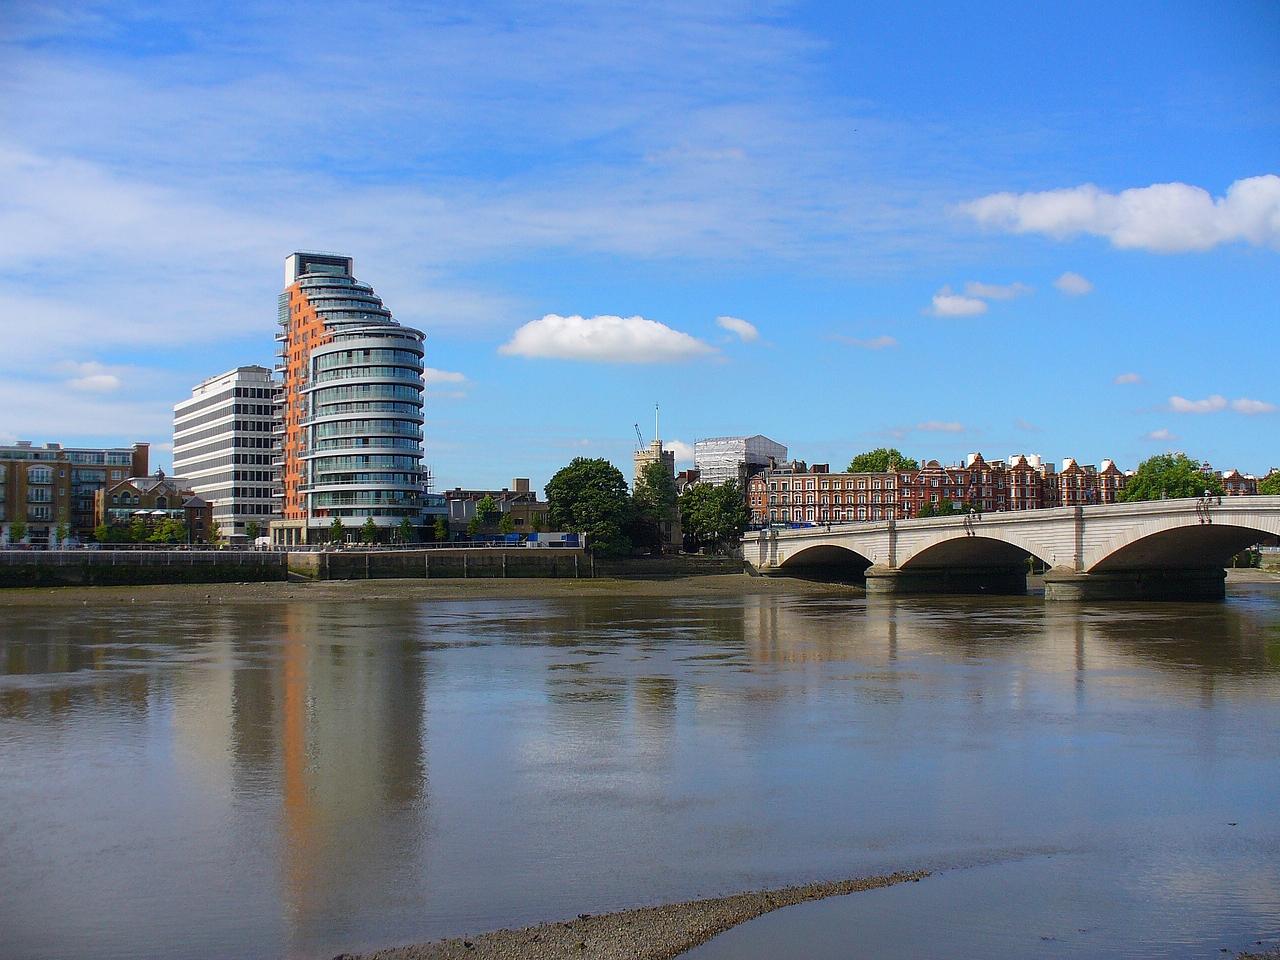 Putney_Bridge,_London